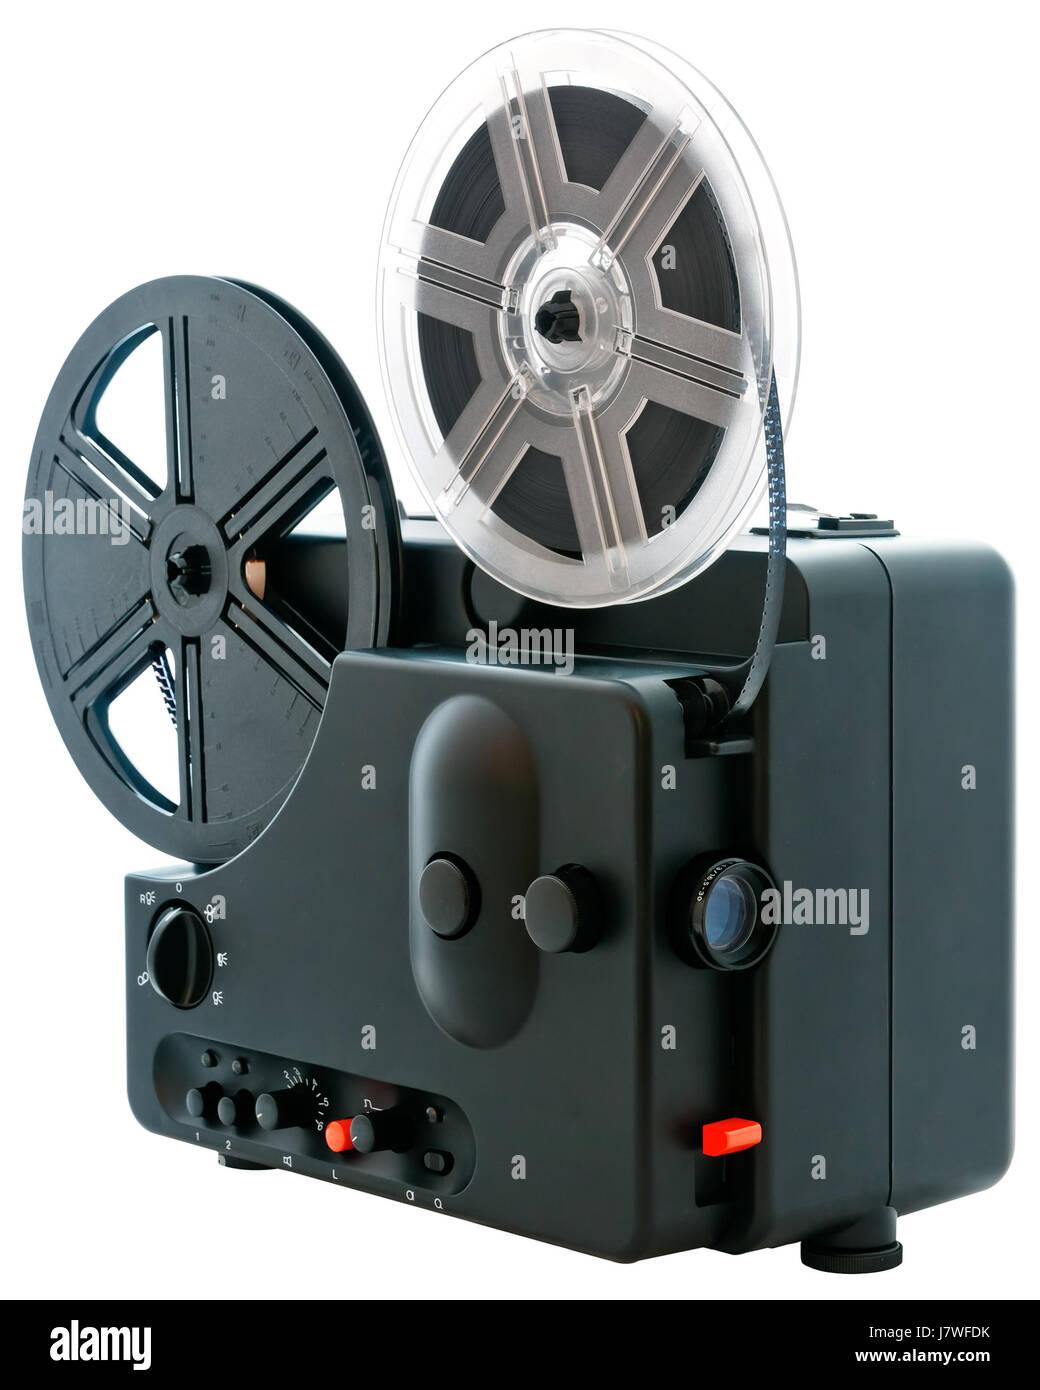 Antique Film Projector Film Reel Film Movie Movies Film Spool Cinema